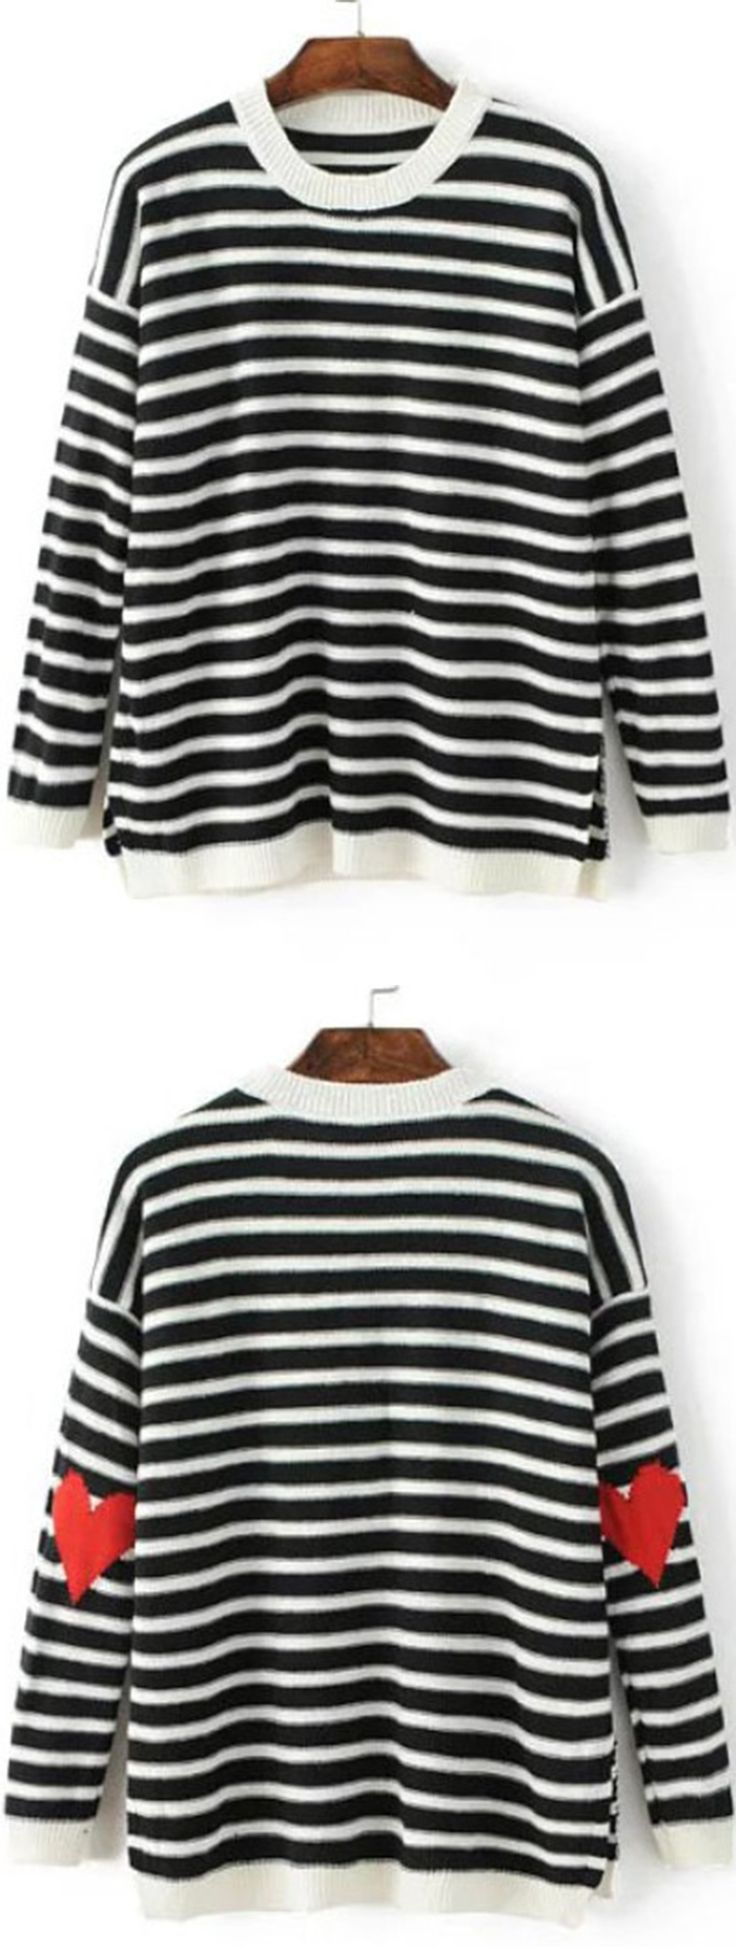 Best 10+ Elbow patch sweater ideas on Pinterest | Polka dot top ...